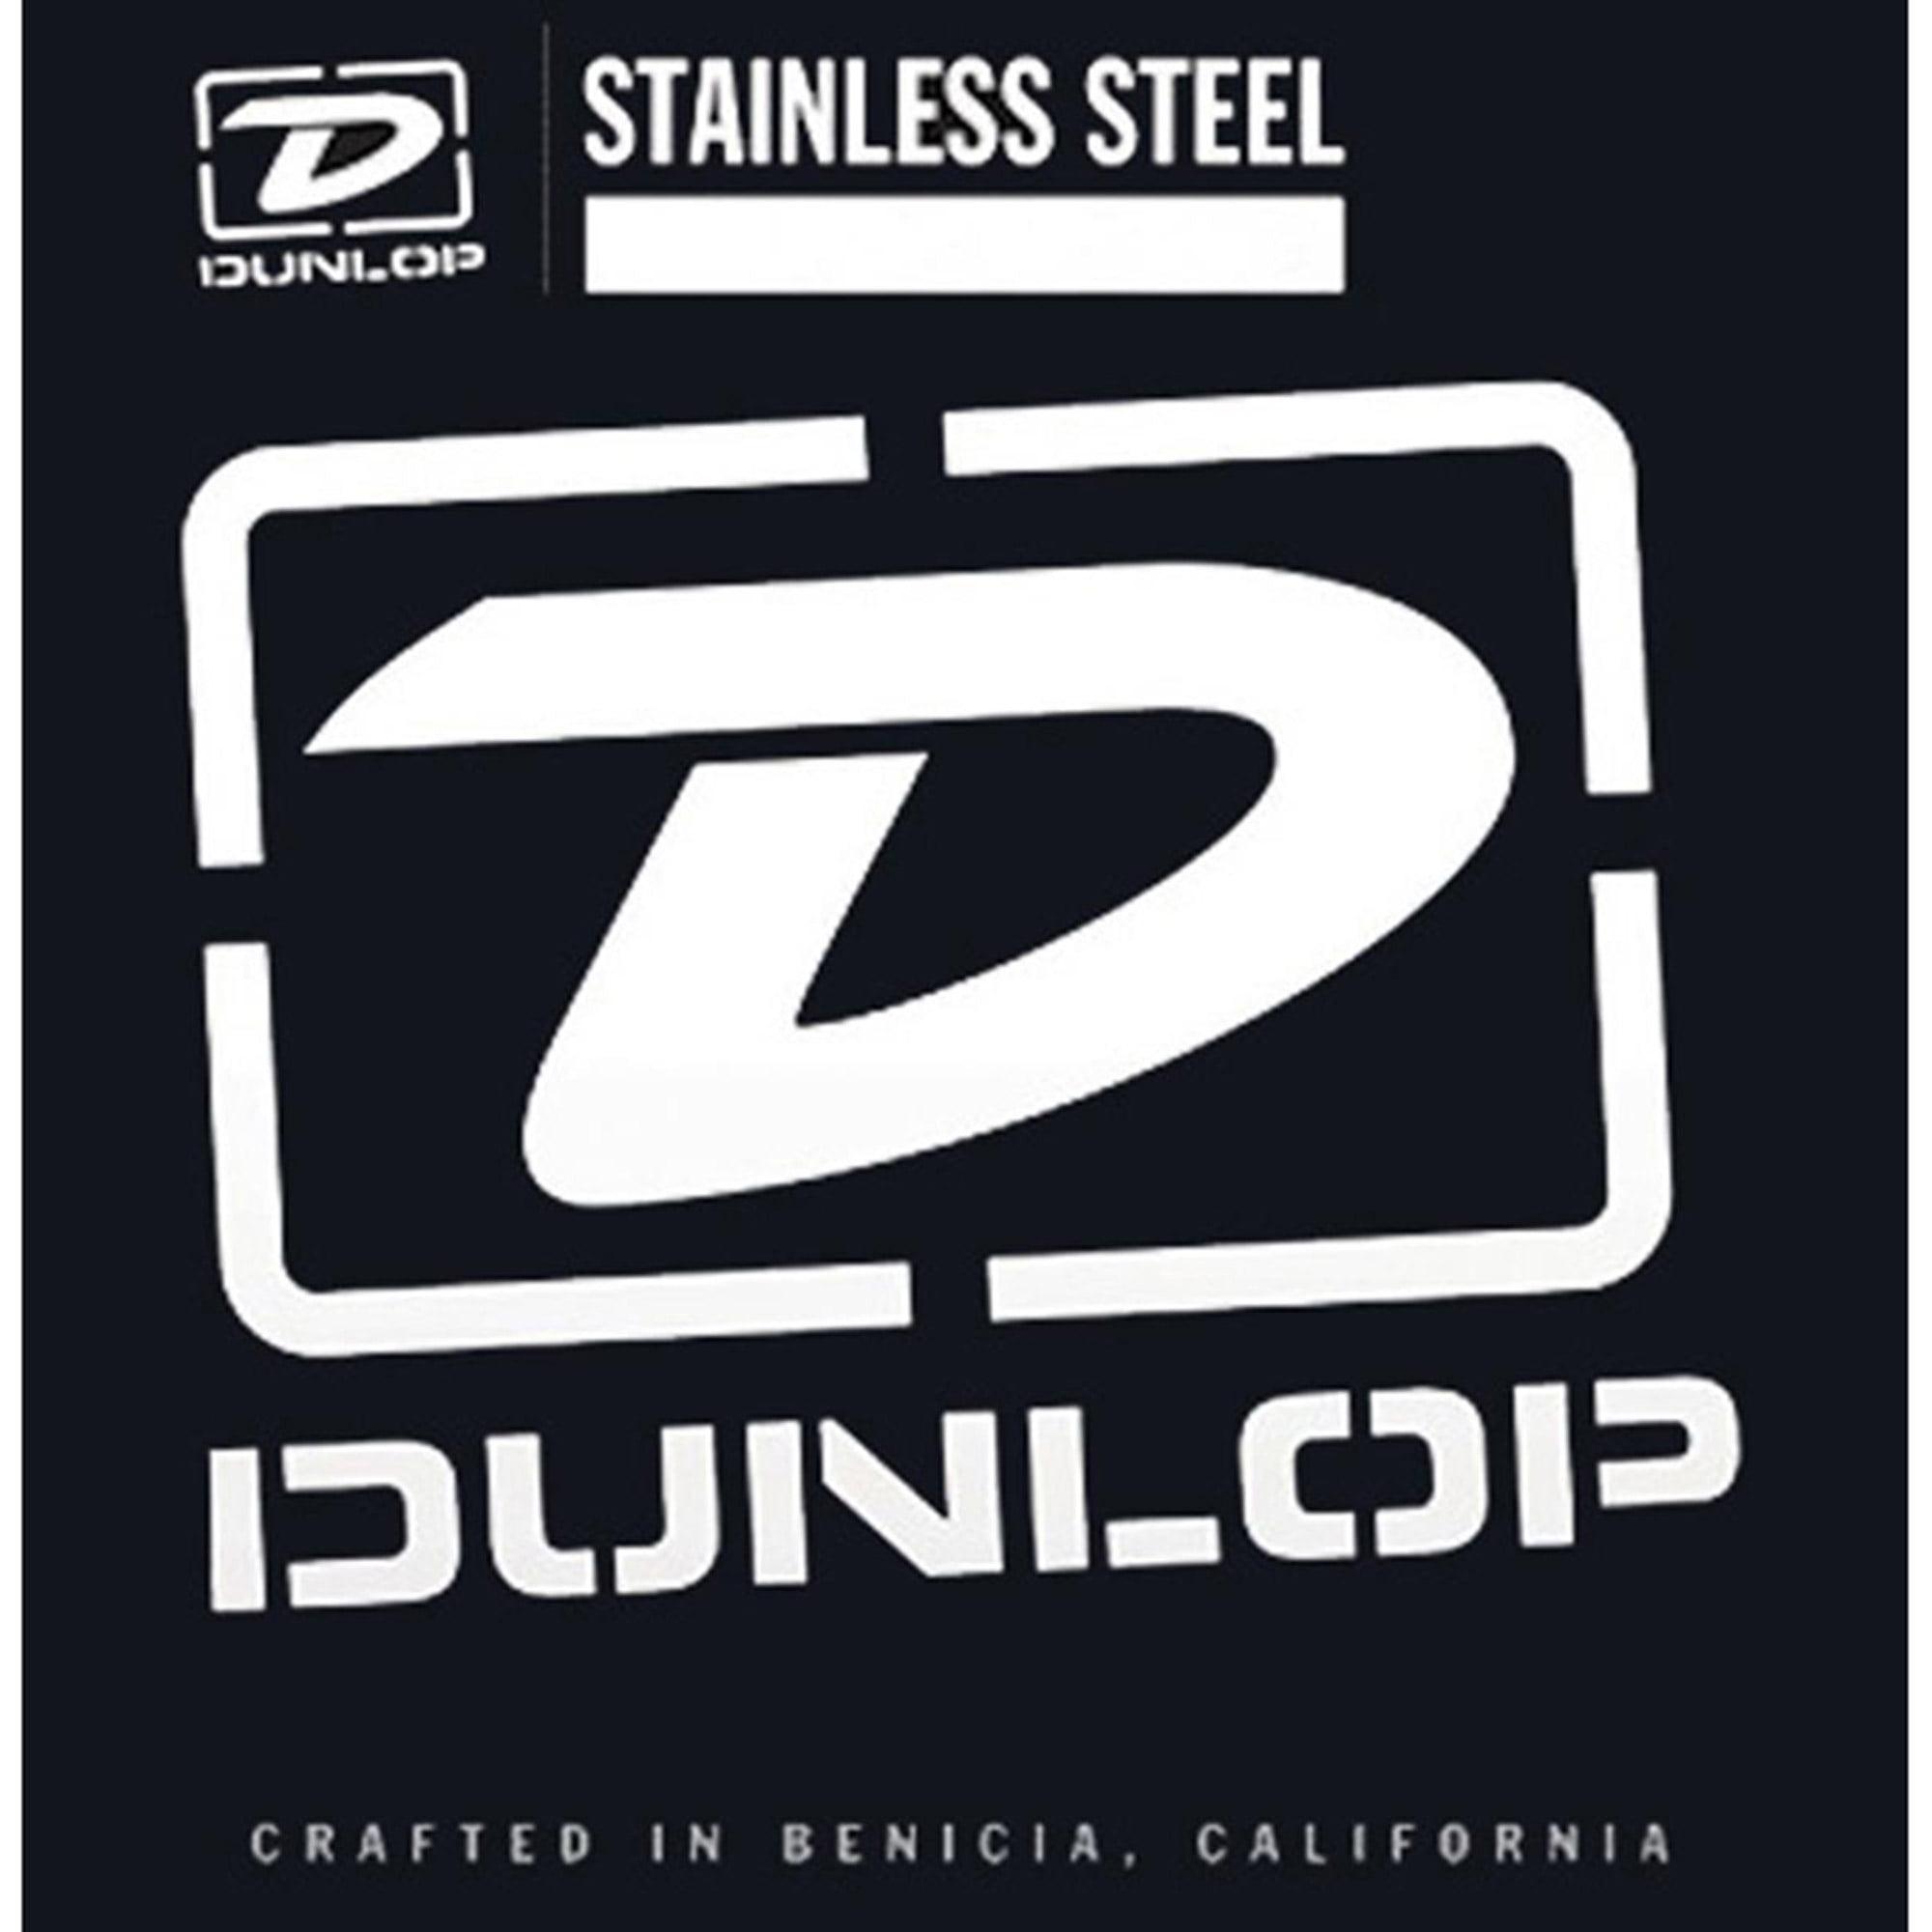 Dunlop DBSBN45125 Super Bright Stainless Steel Bass 5 String Set, .45-.125 by Dunlop